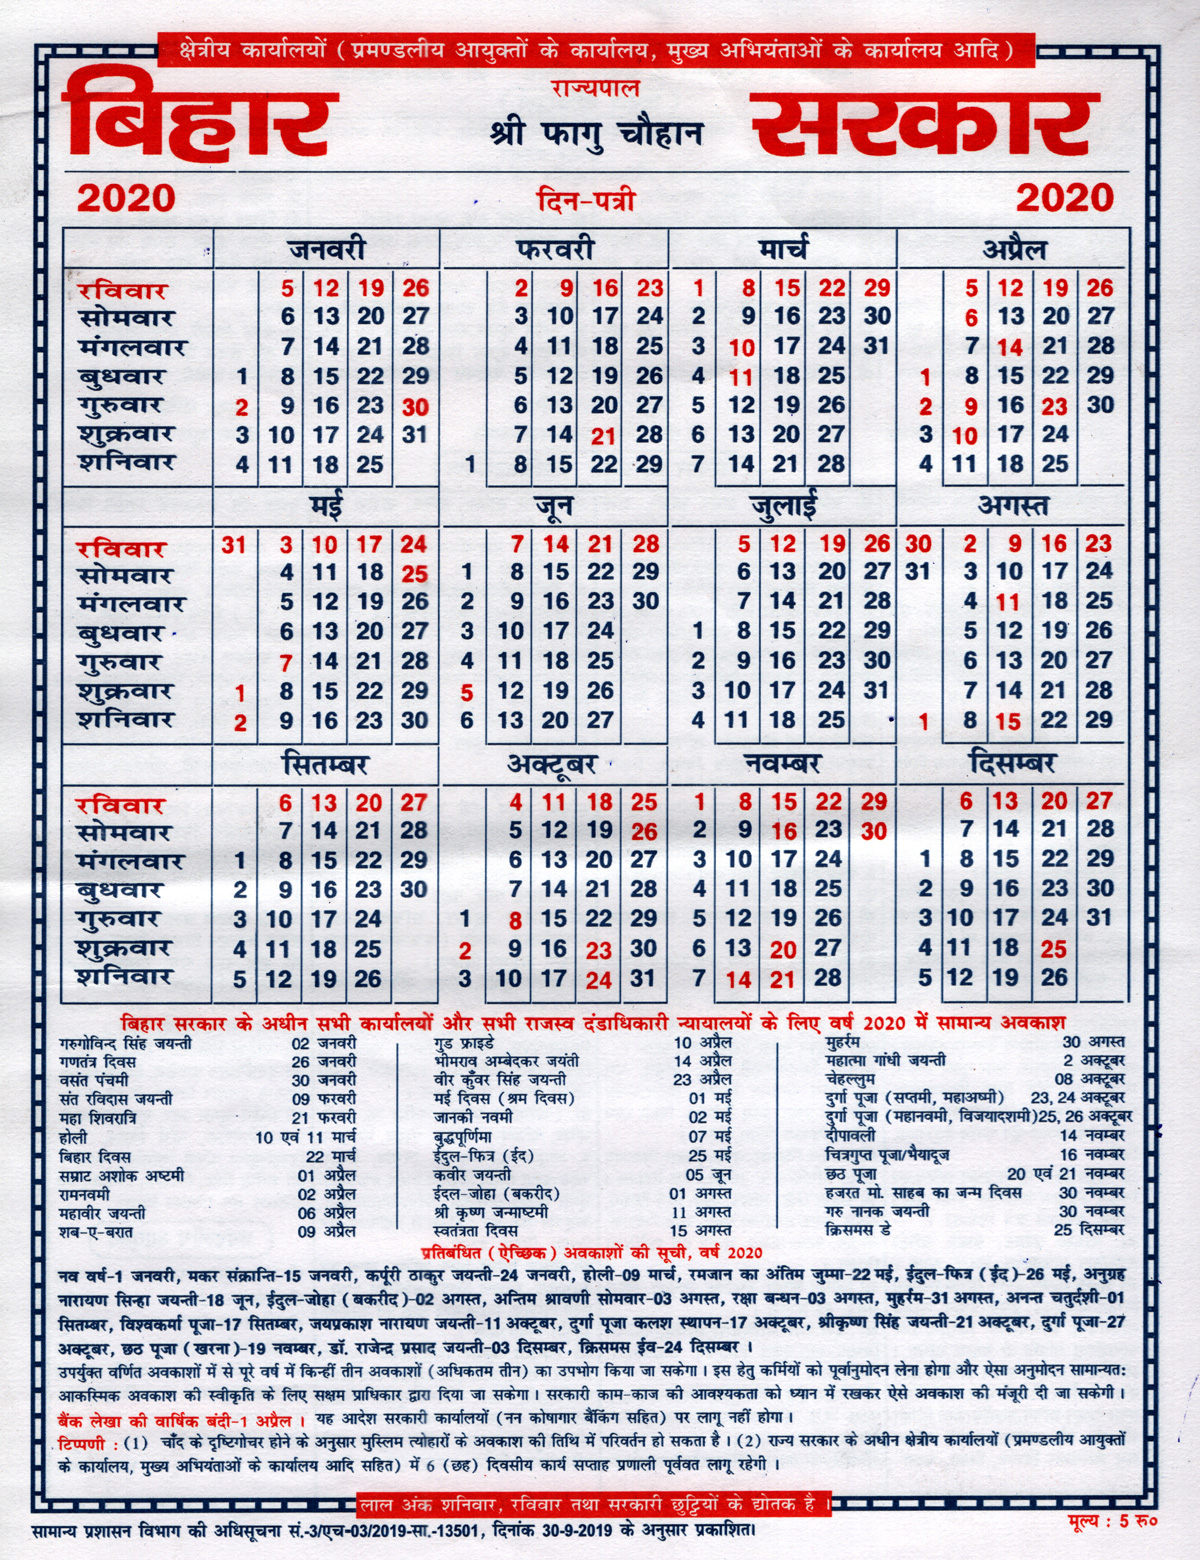 Bihar Govt. Calendar  Patna Bihar Directory throughout Bihar Government Calander